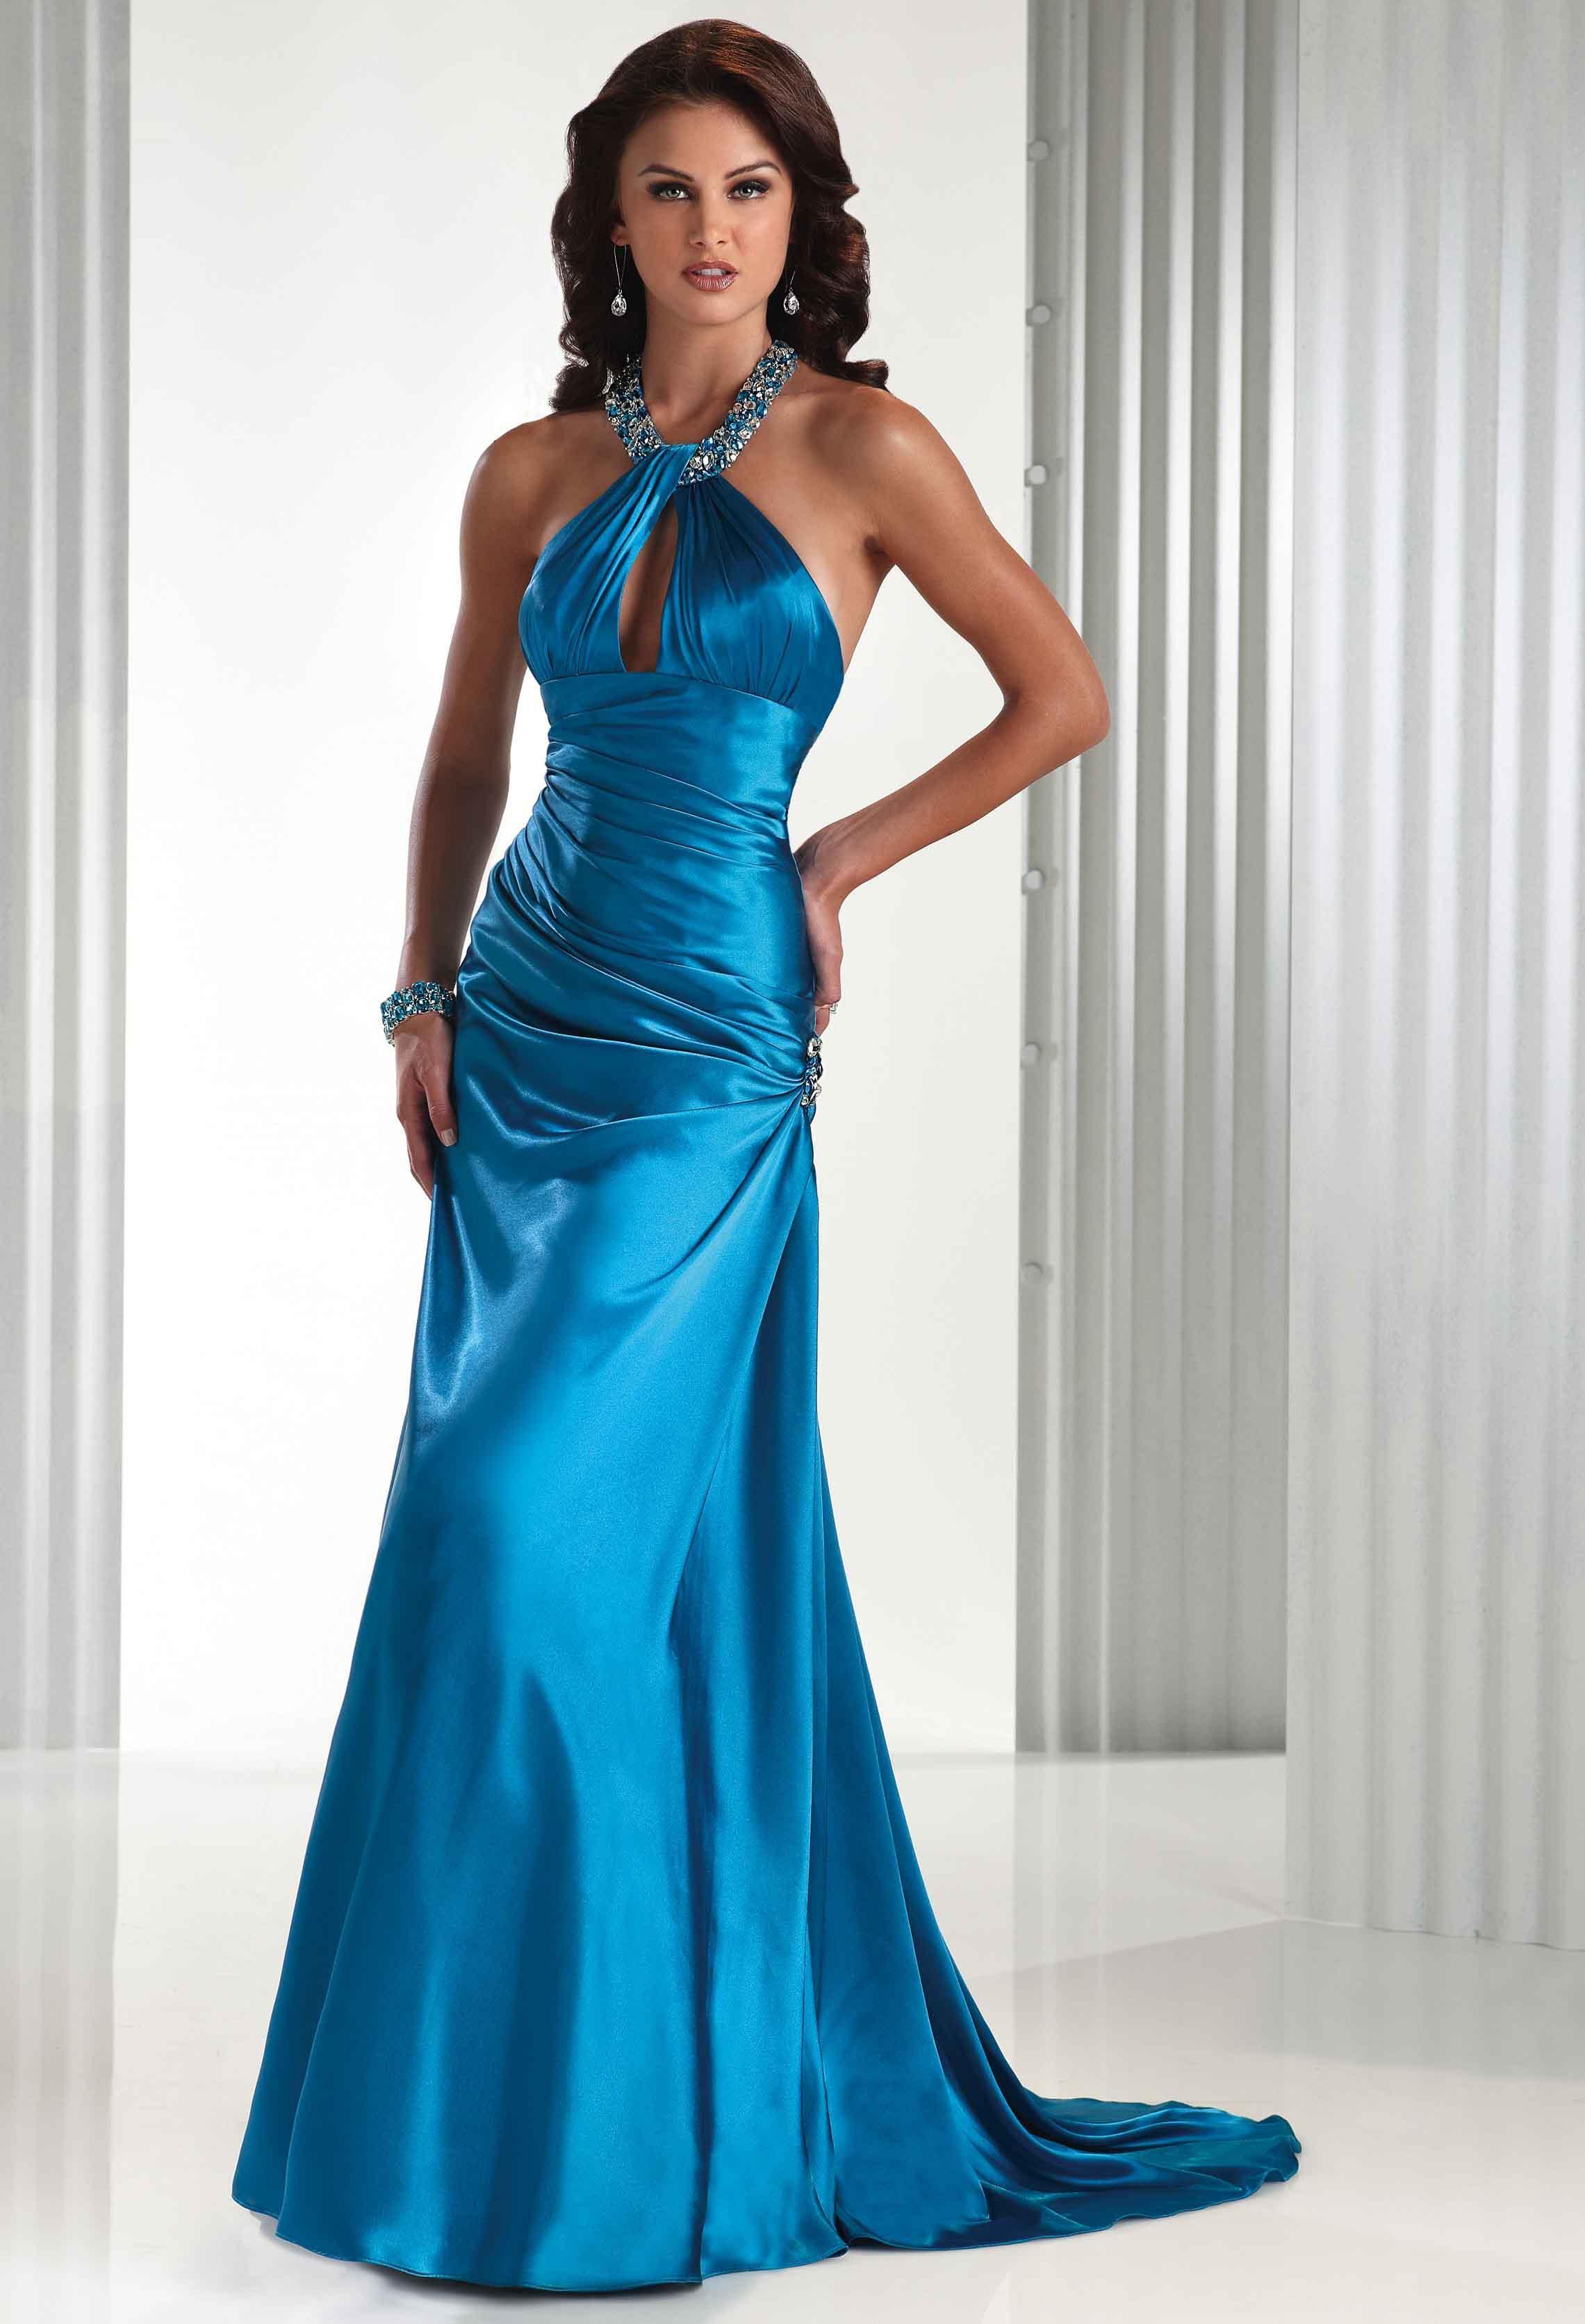 купить платье в пол большого размера ...: koketka.r7w.ru/genskie-krasivie-platya.html